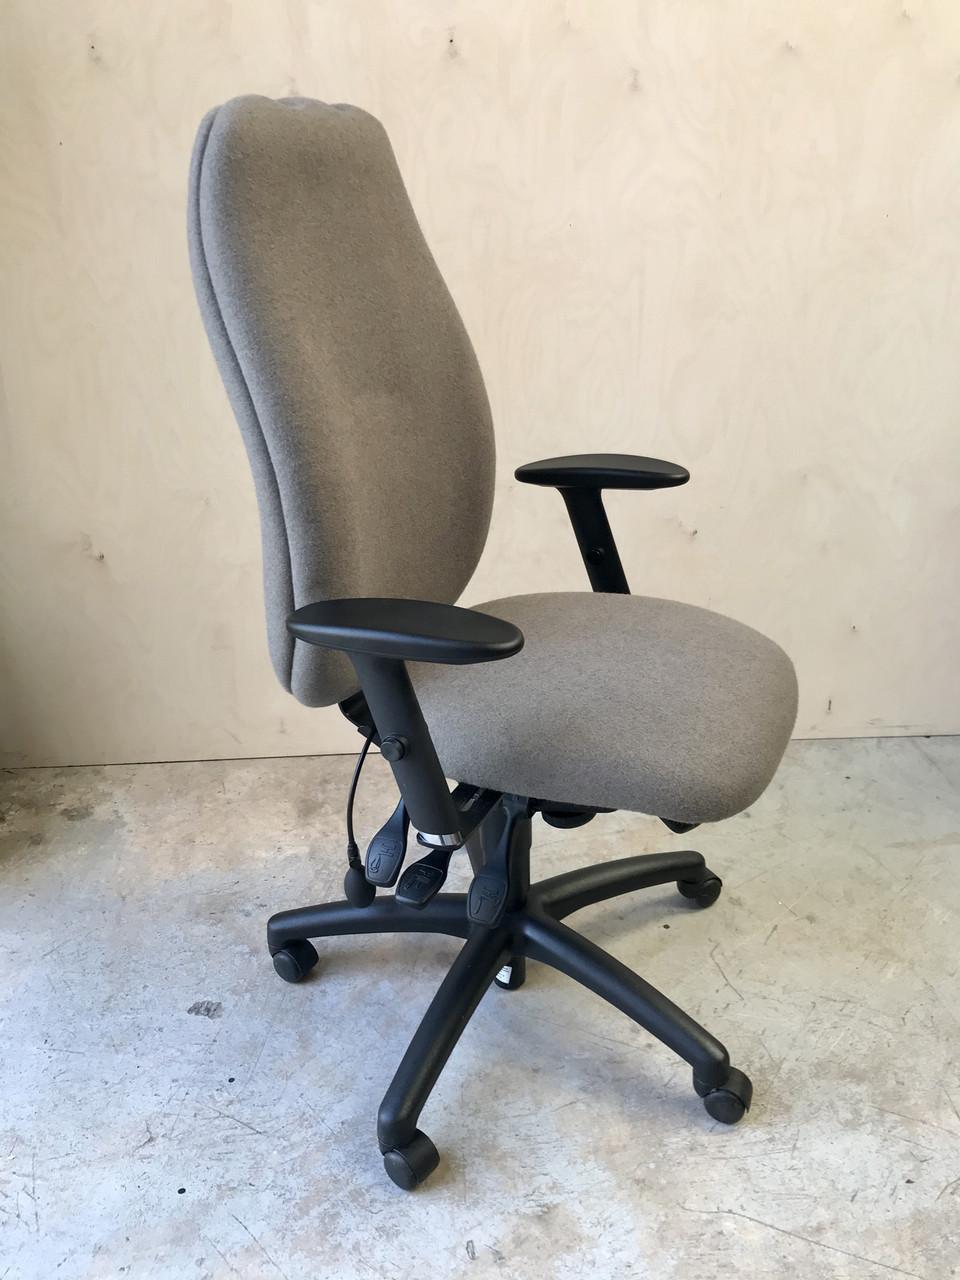 High back ergonomic chair in Grey fabric - UC06